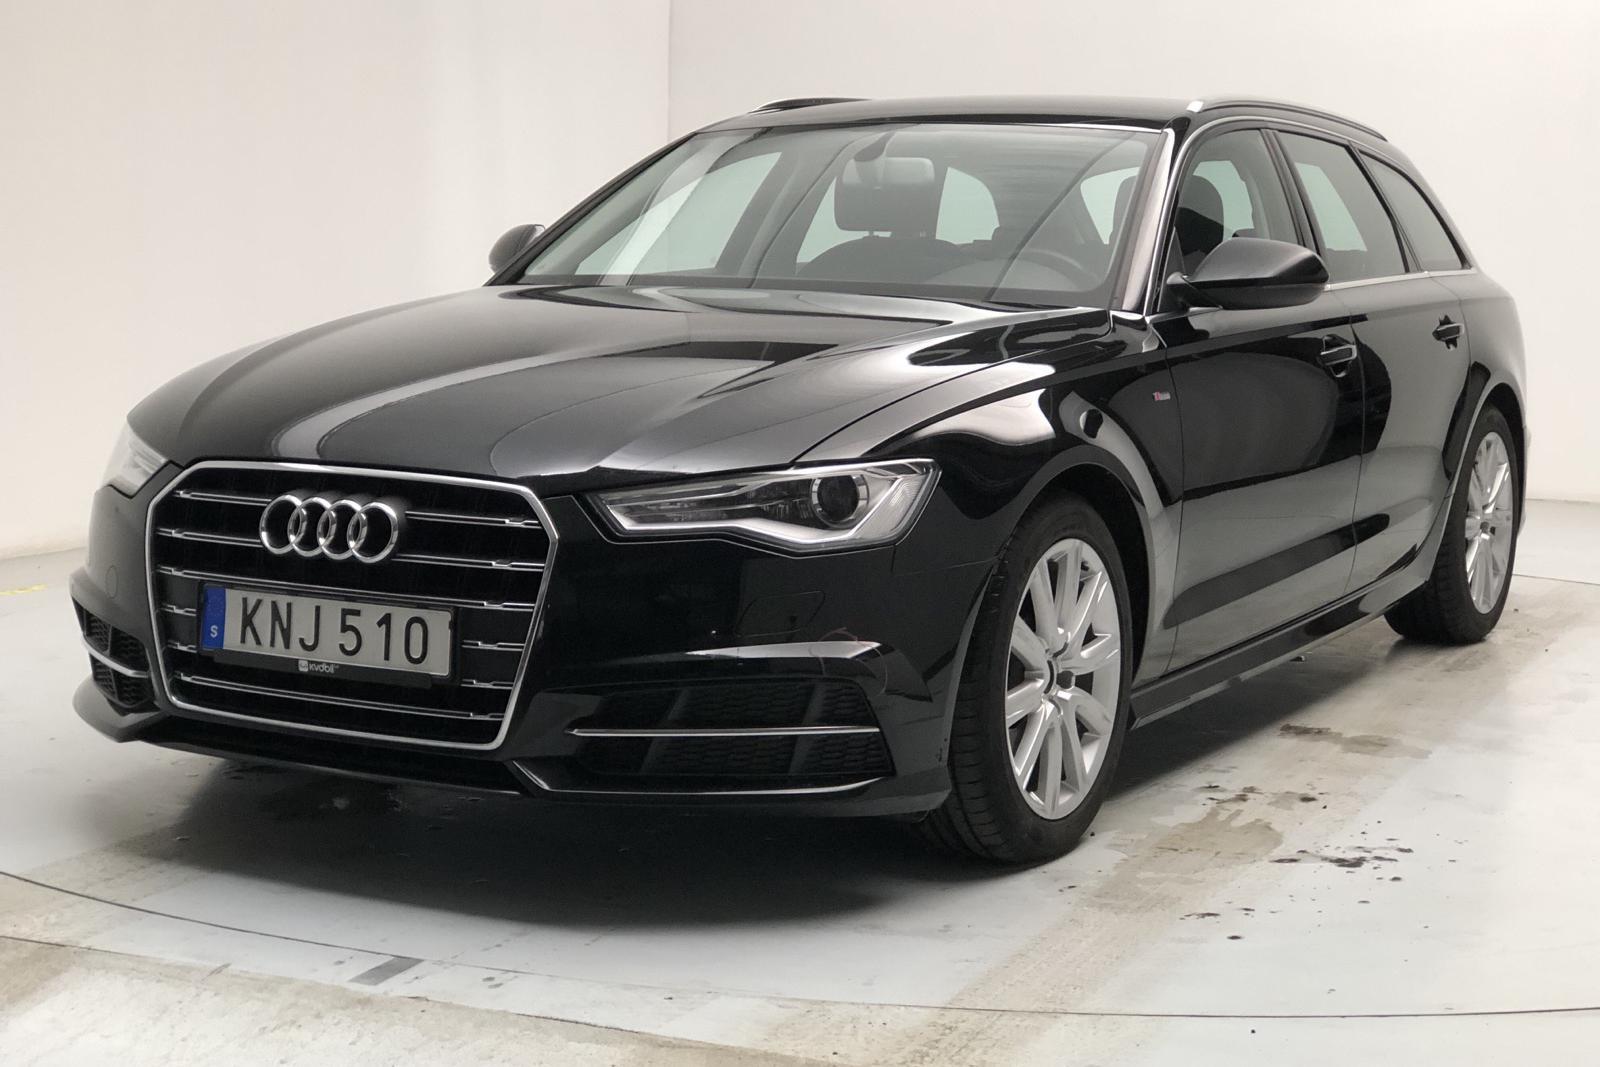 Audi A6 2.0 TDI Avant (190hk) - 72 670 km - Manual - black - 2017